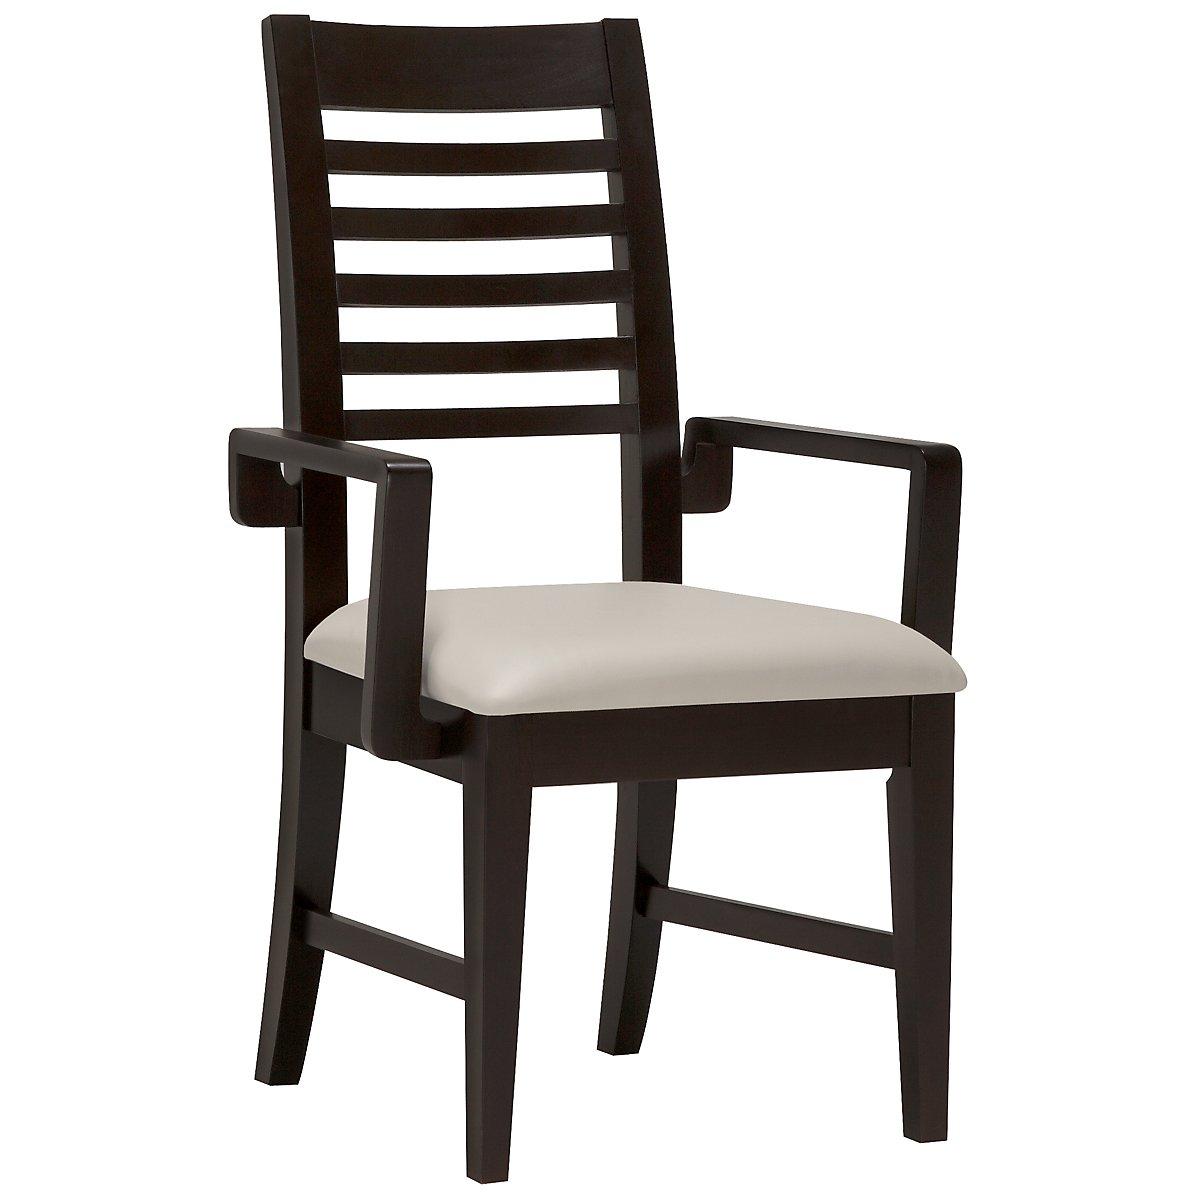 Encore2 Dark Tone Bonded Leather Slat Arm Chair